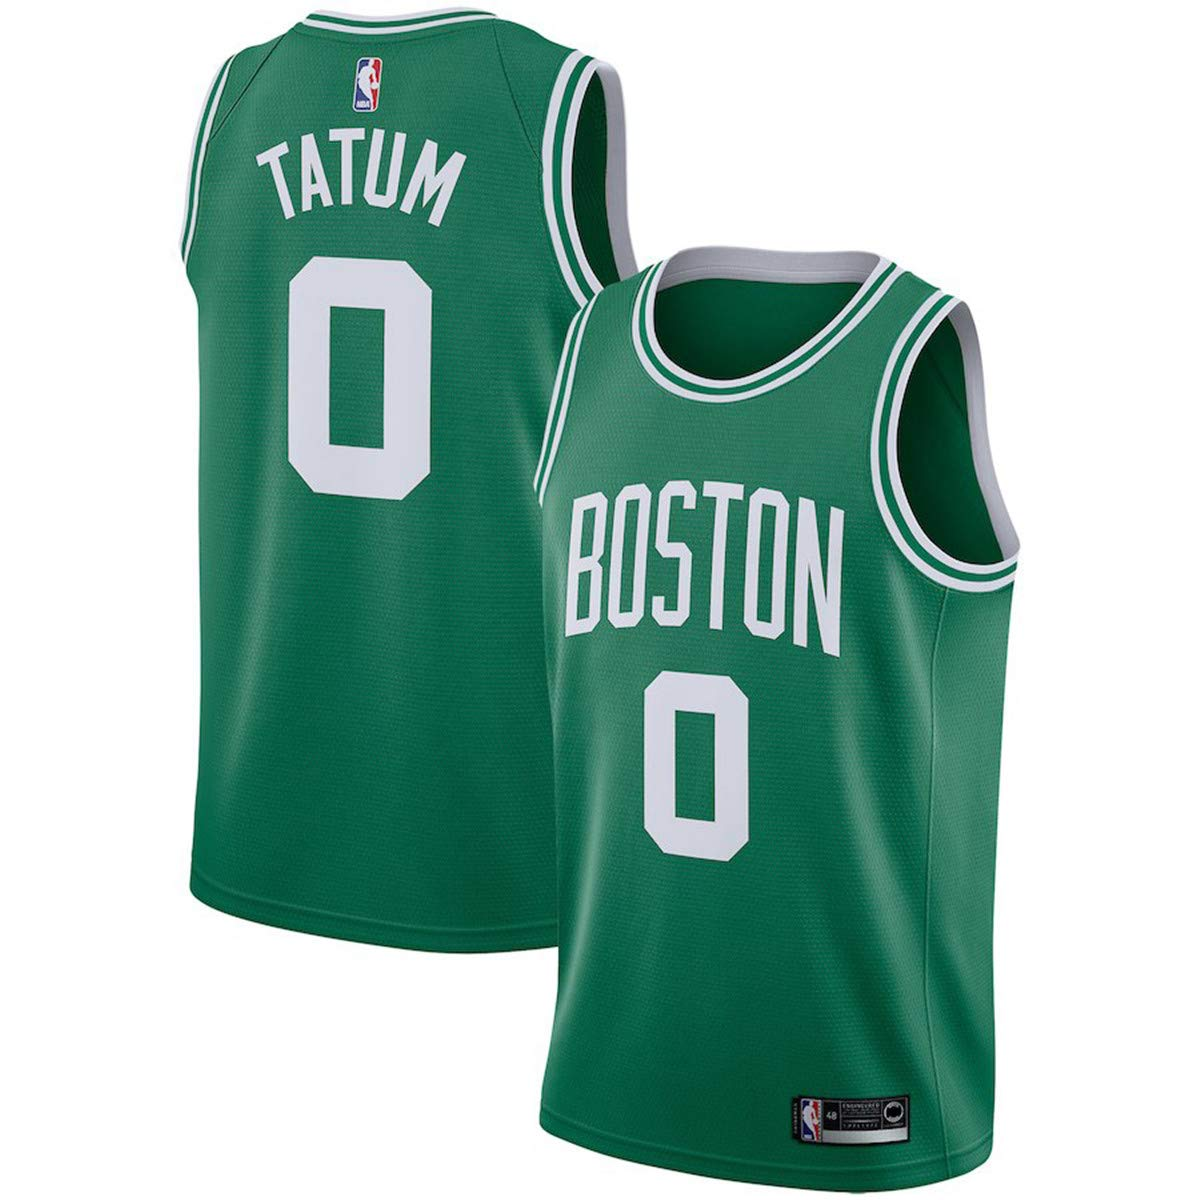 e94dbd033223b Majestic Athletic Men's Boston Celtics Jayson Tatum Swingman Jersey-Green